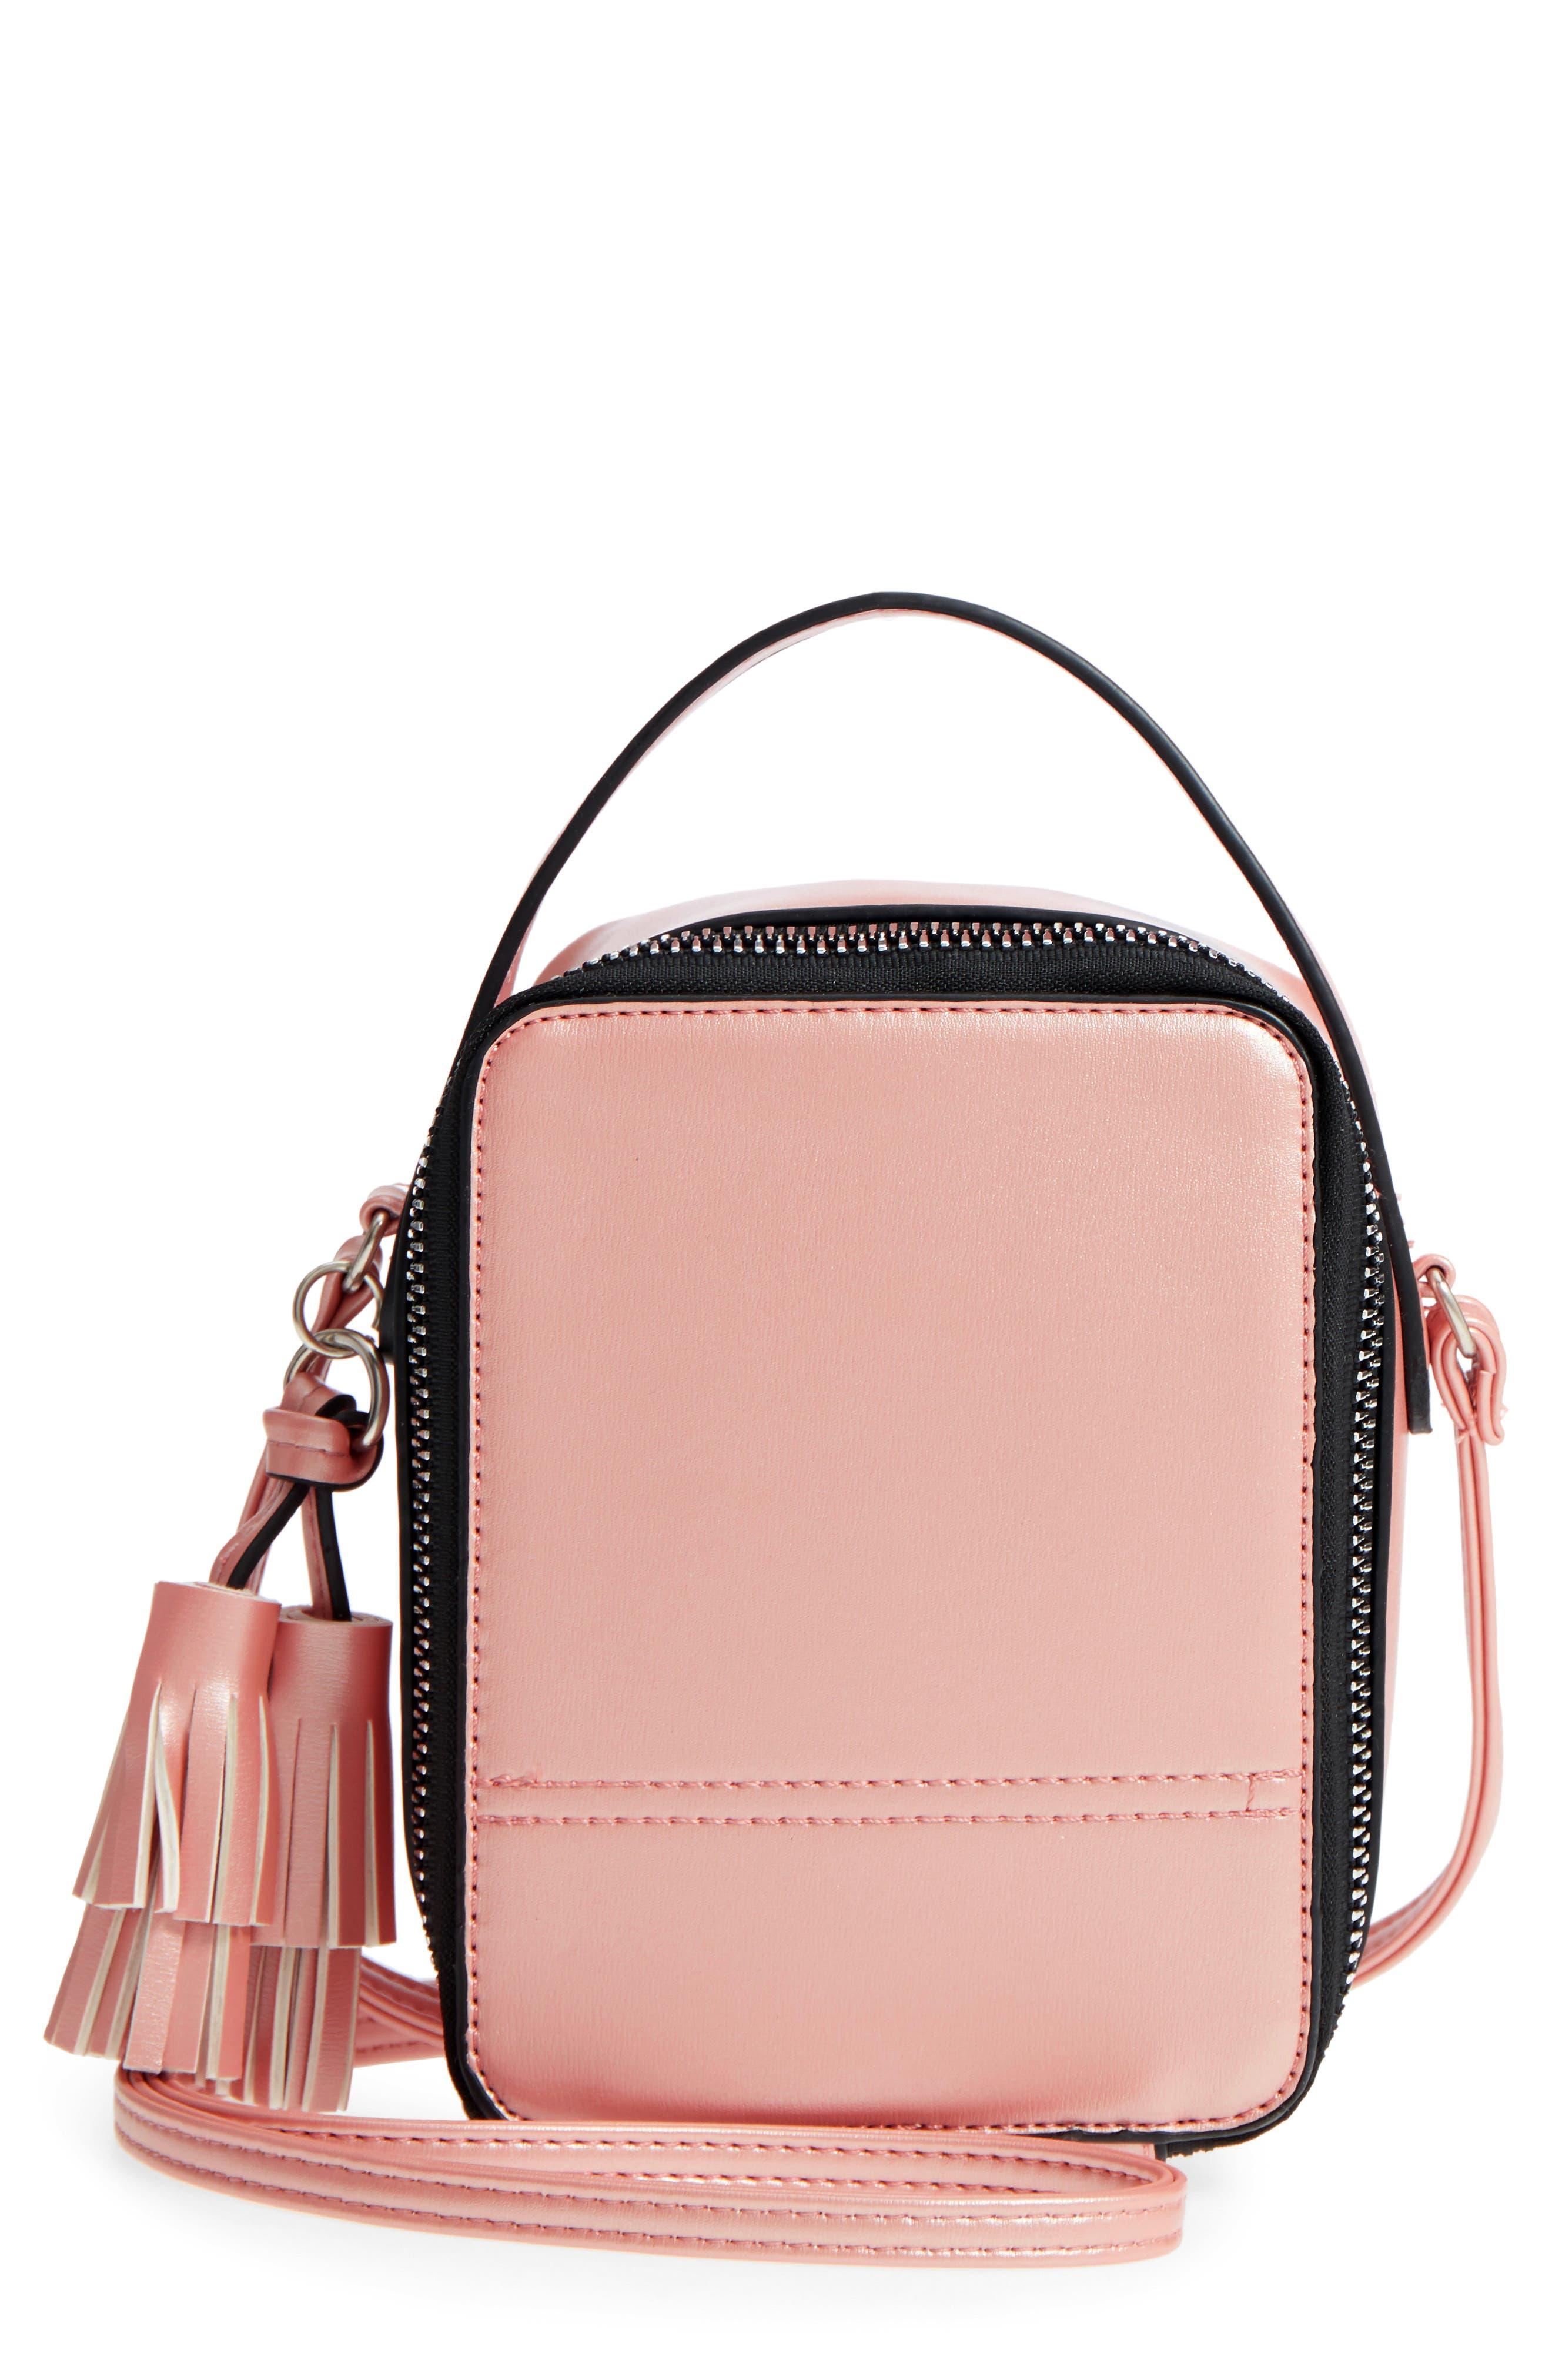 Tassel Metallic Faux Leather Box Bag,                             Main thumbnail 1, color,                             710